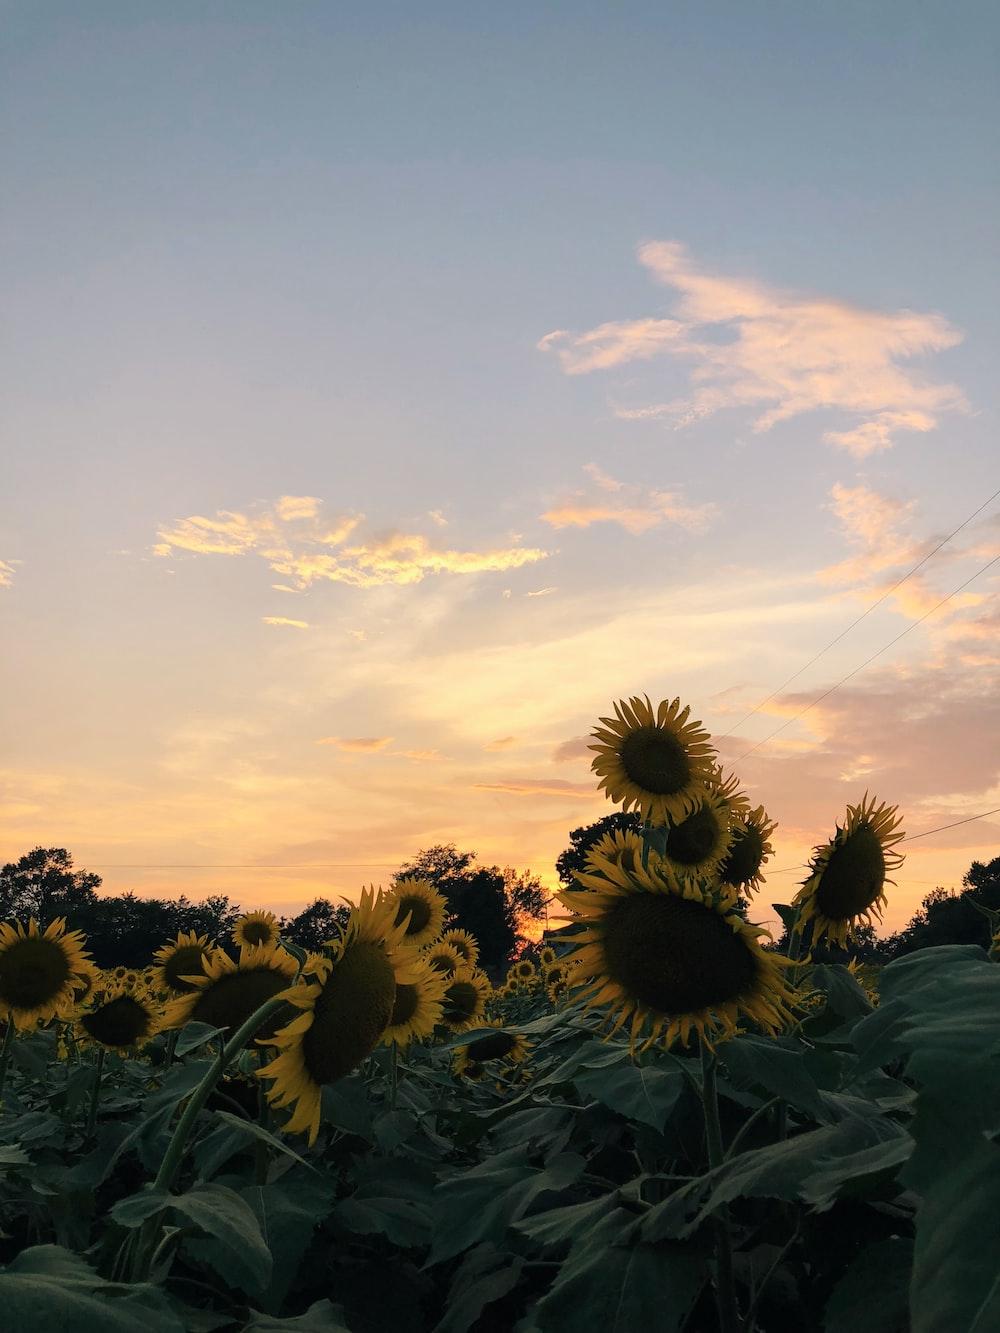 sunflower under blue sky during golden hour